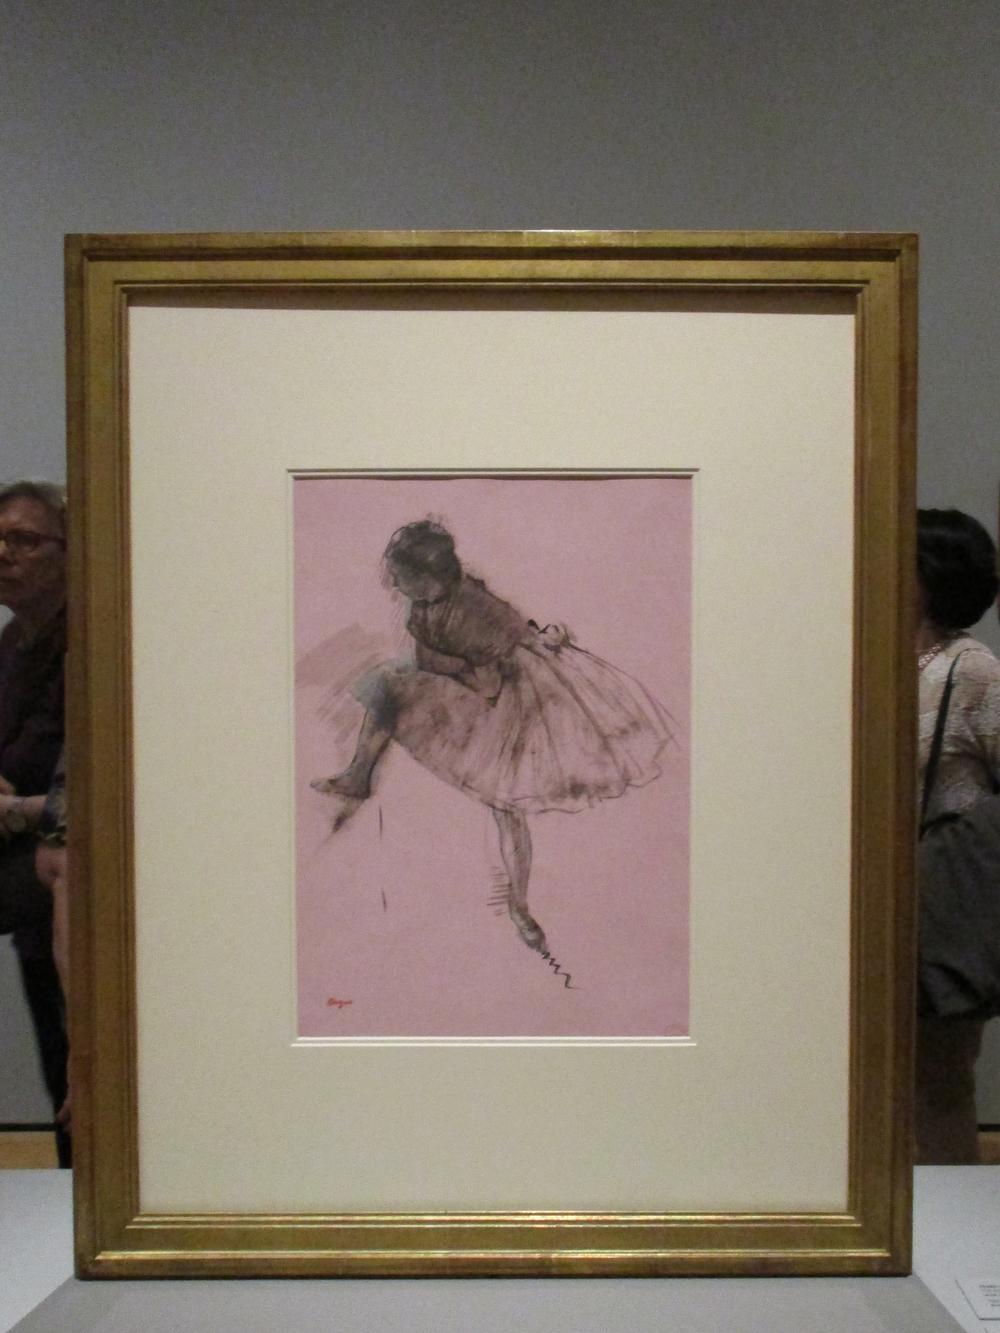 My main man Degas